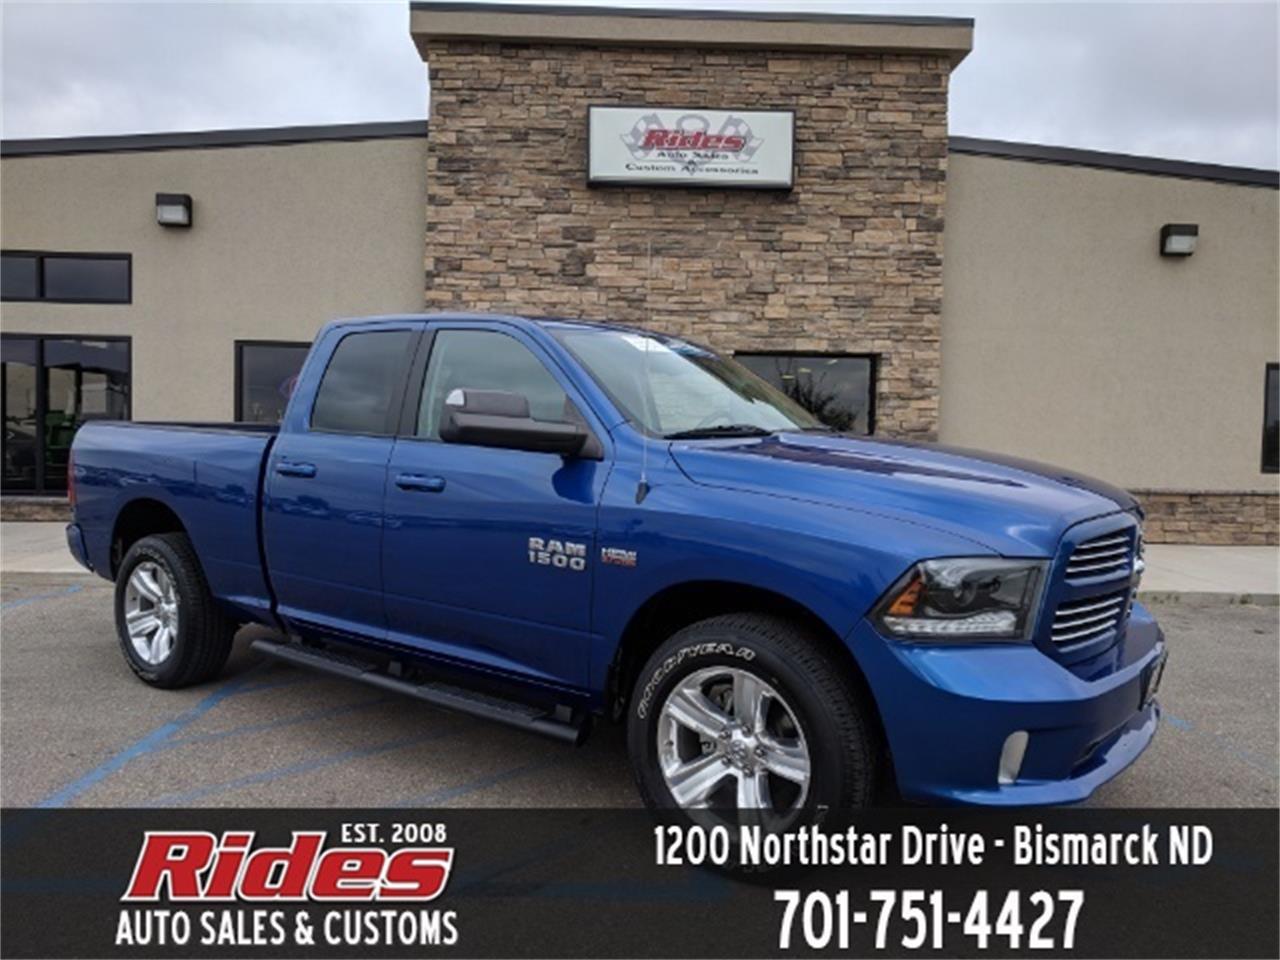 2015 Dodge Ram 1500 For Sale >> For Sale 2015 Dodge Ram 1500 In Bismarck North Dakota